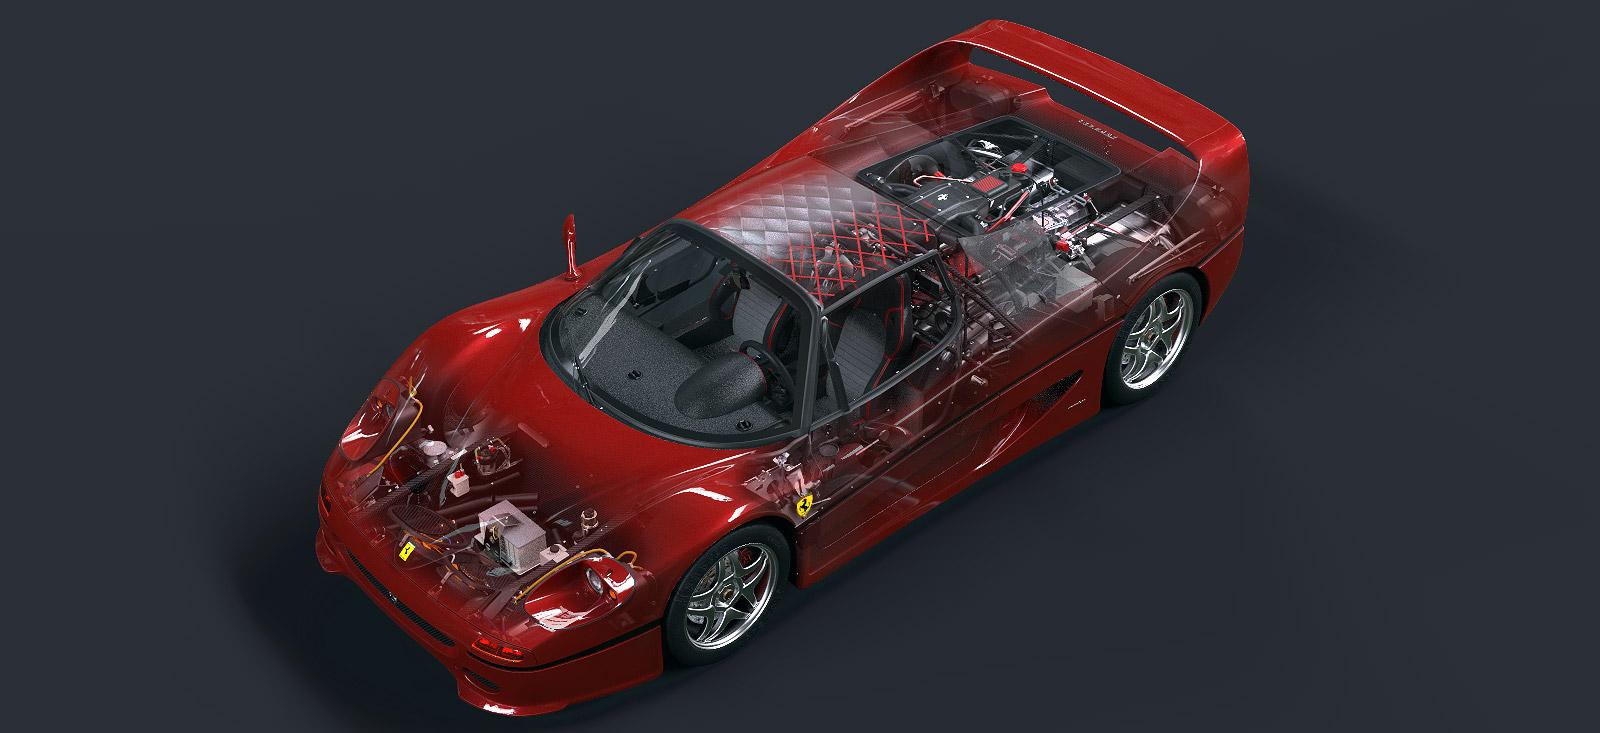 Ferrari F50 cutaway